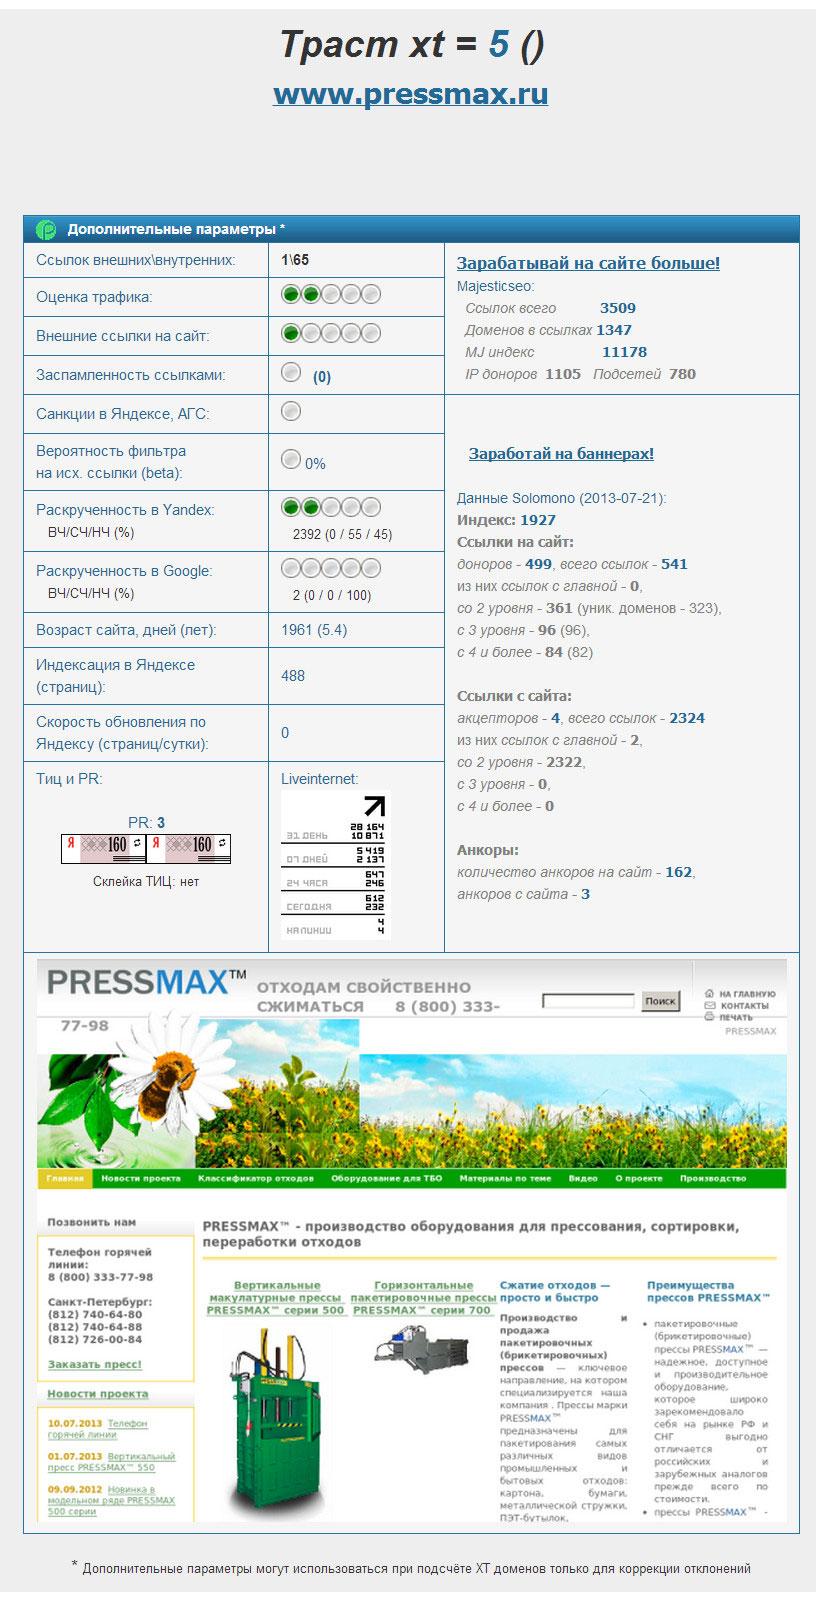 Продвижение сайта pressmax.ru траст